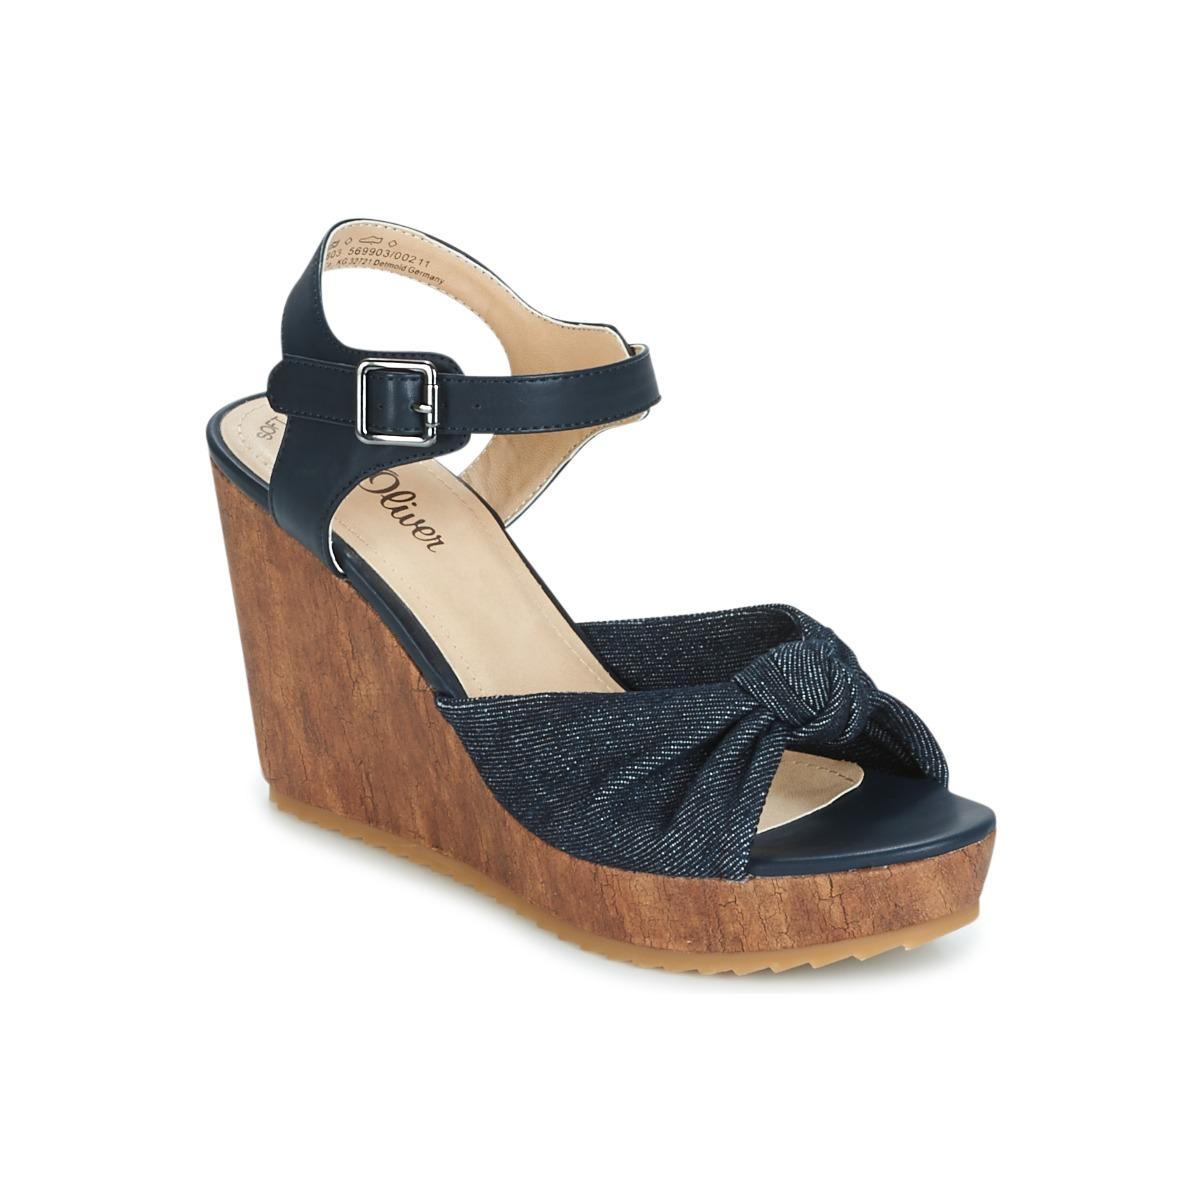 SOliver  Comb - Kostenloser Versand bei Spartoode ! - Schuhe Sandalen / Sandaletten Damen 49,00 €